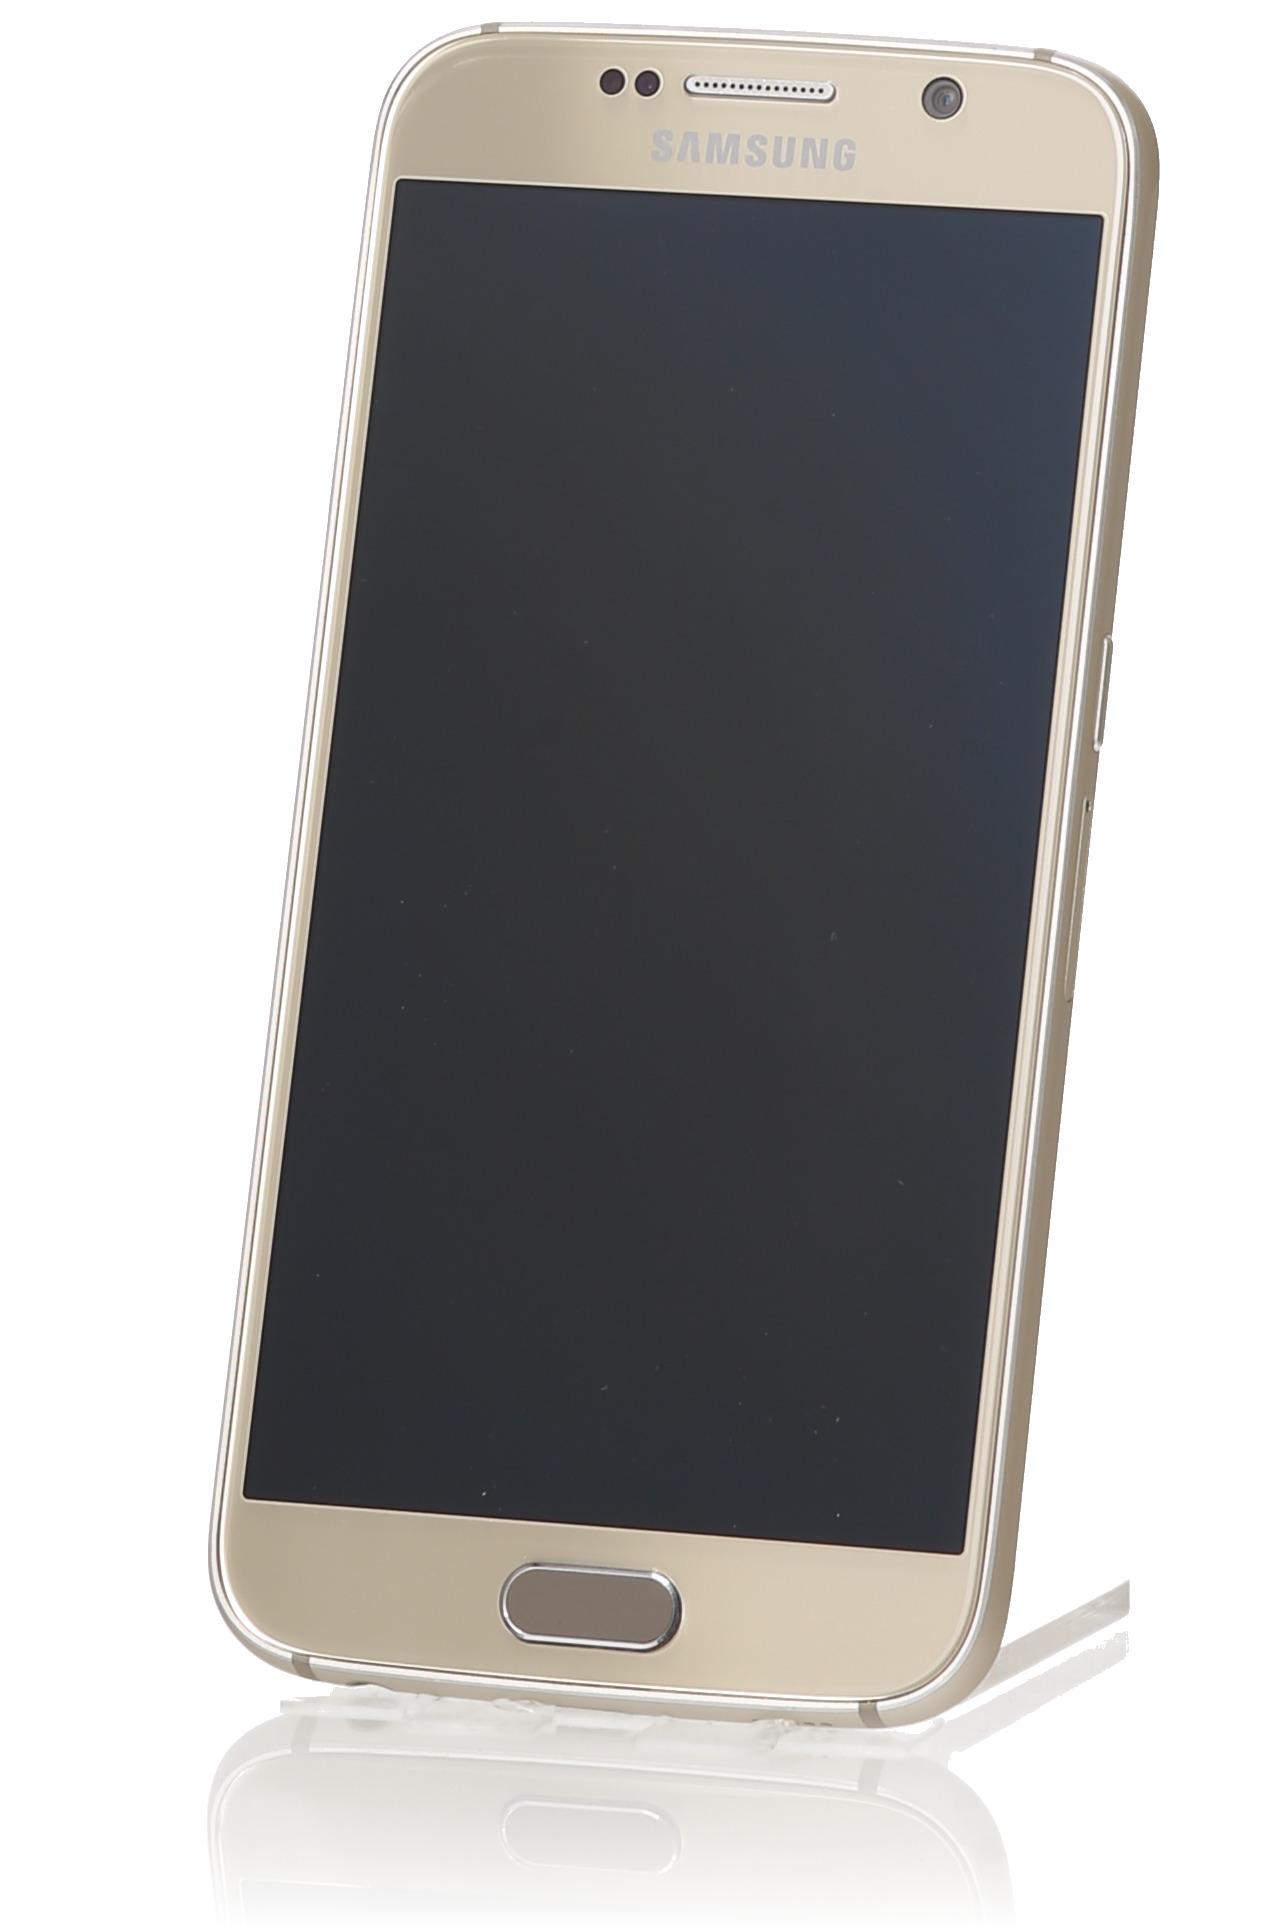 Samsung G920F Galaxy S6 32GB gold platinum